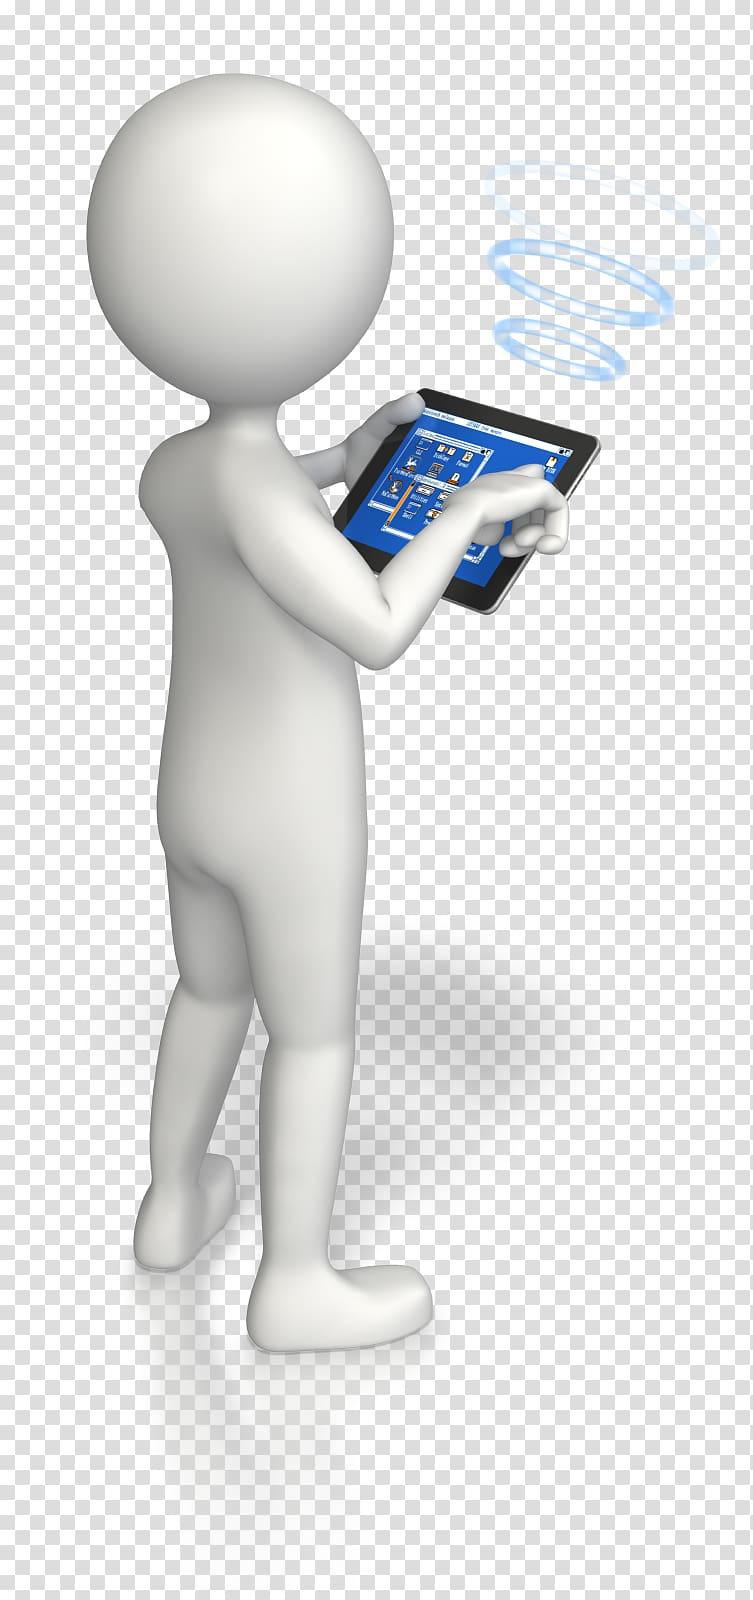 Microsoft PowerPoint Stick figure PowerPoint animation.